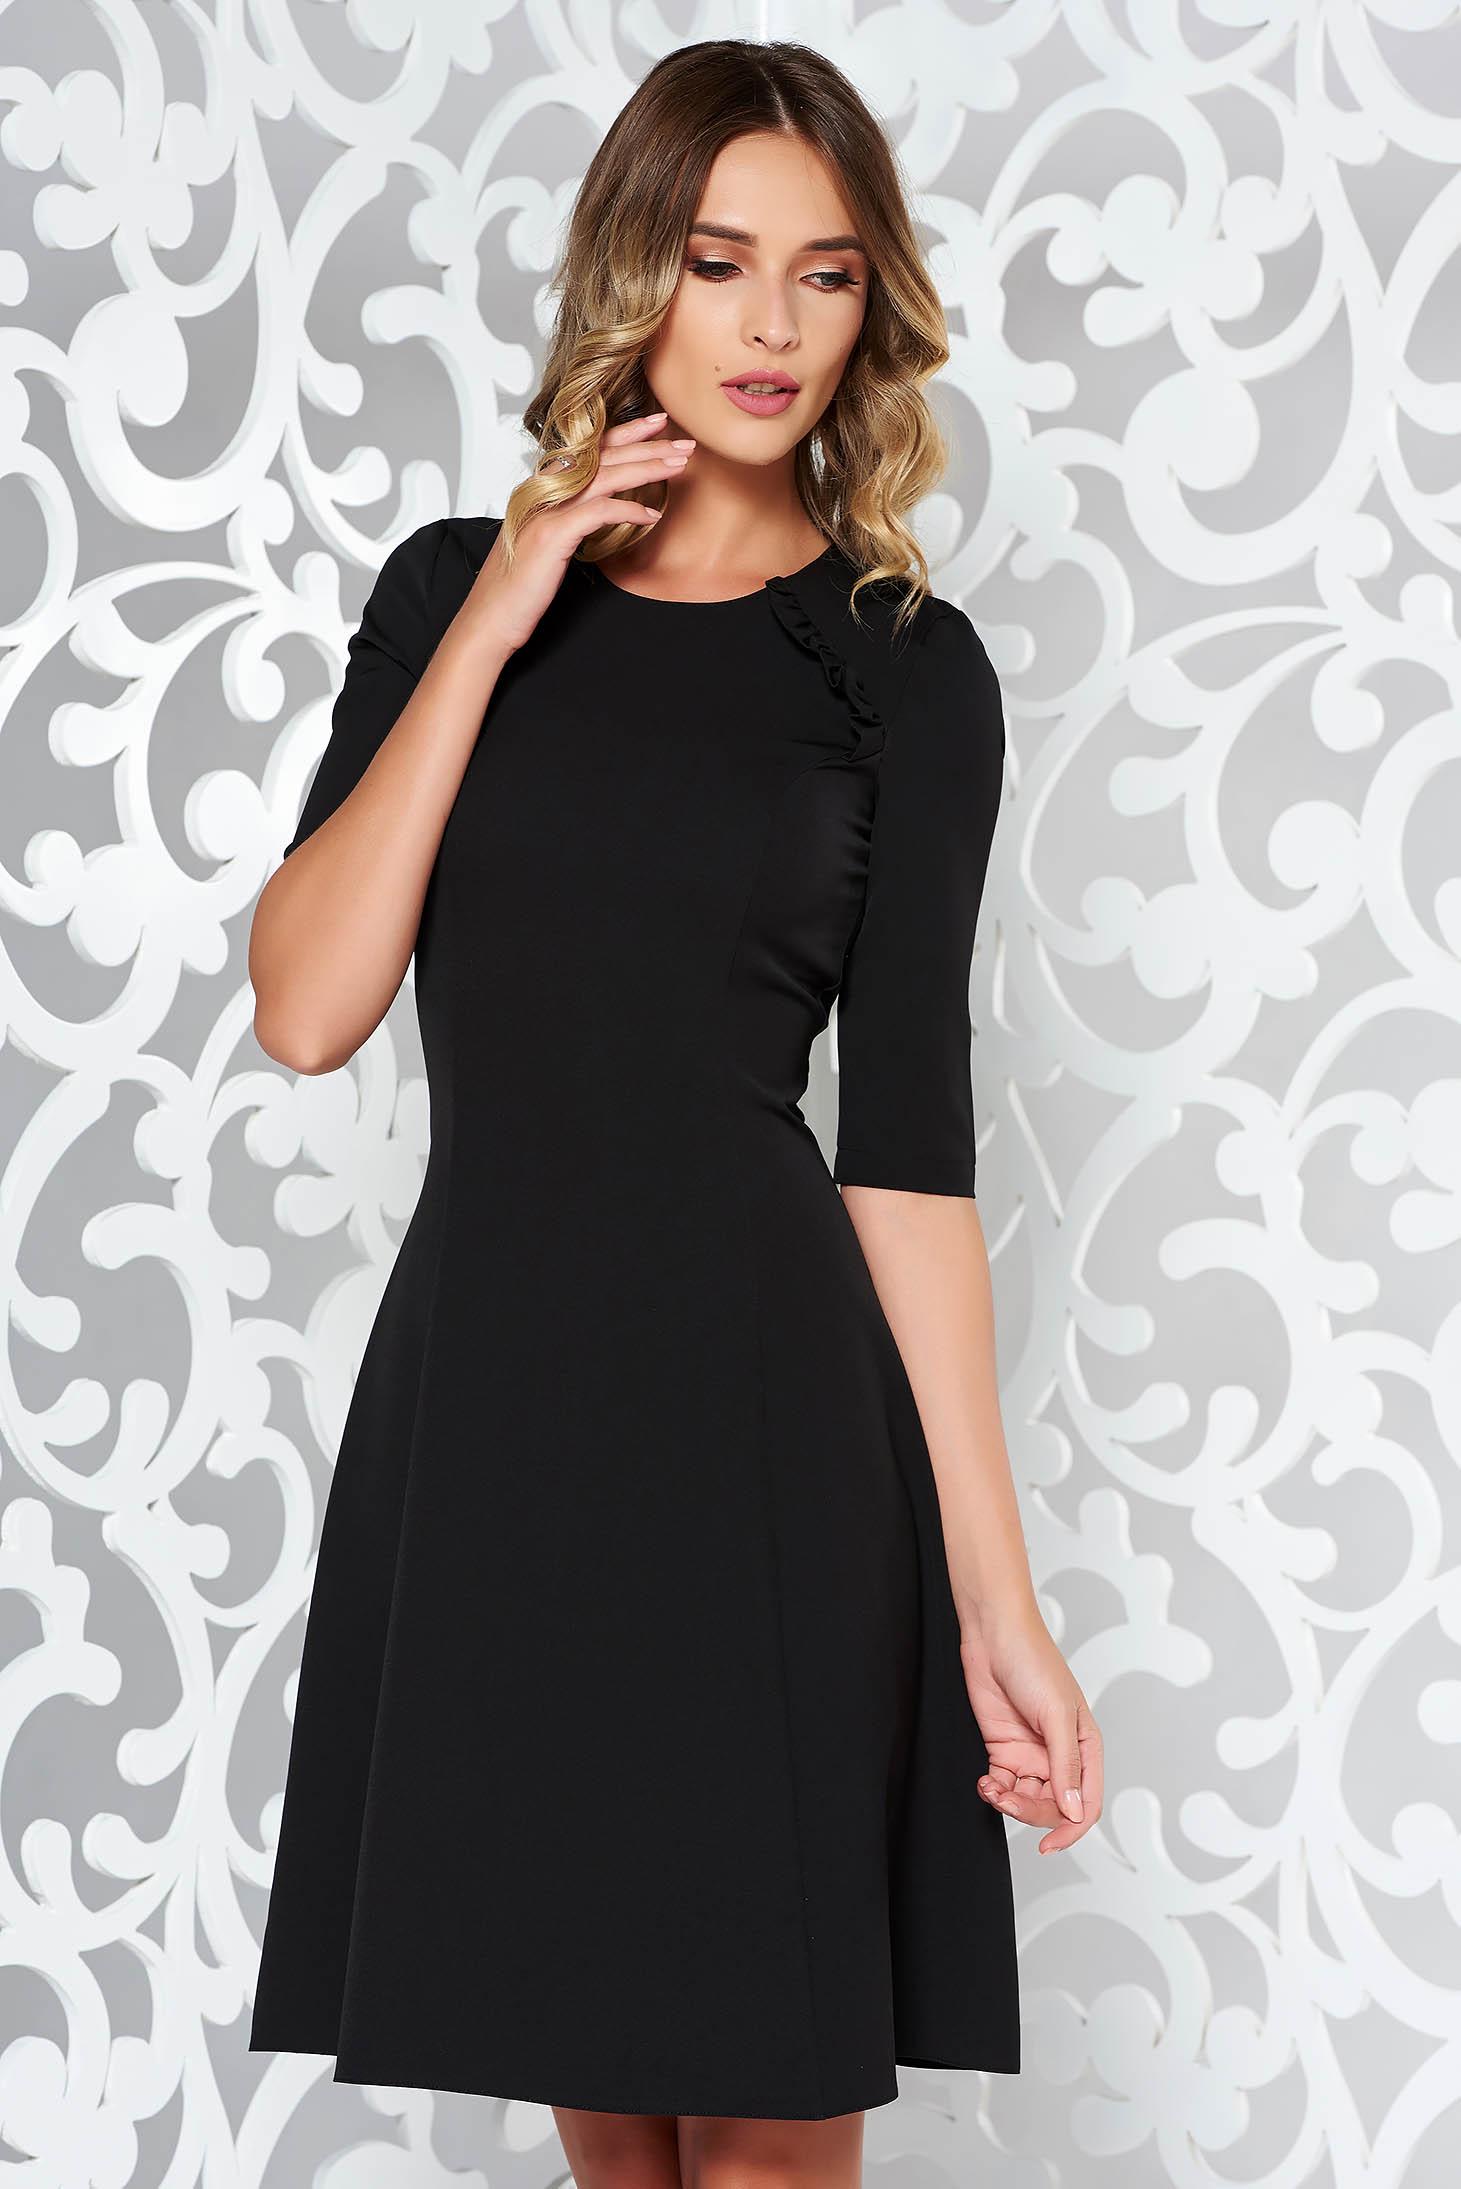 StarShinerS black office midi cloche dress slightly elastic fabric with ruffle details